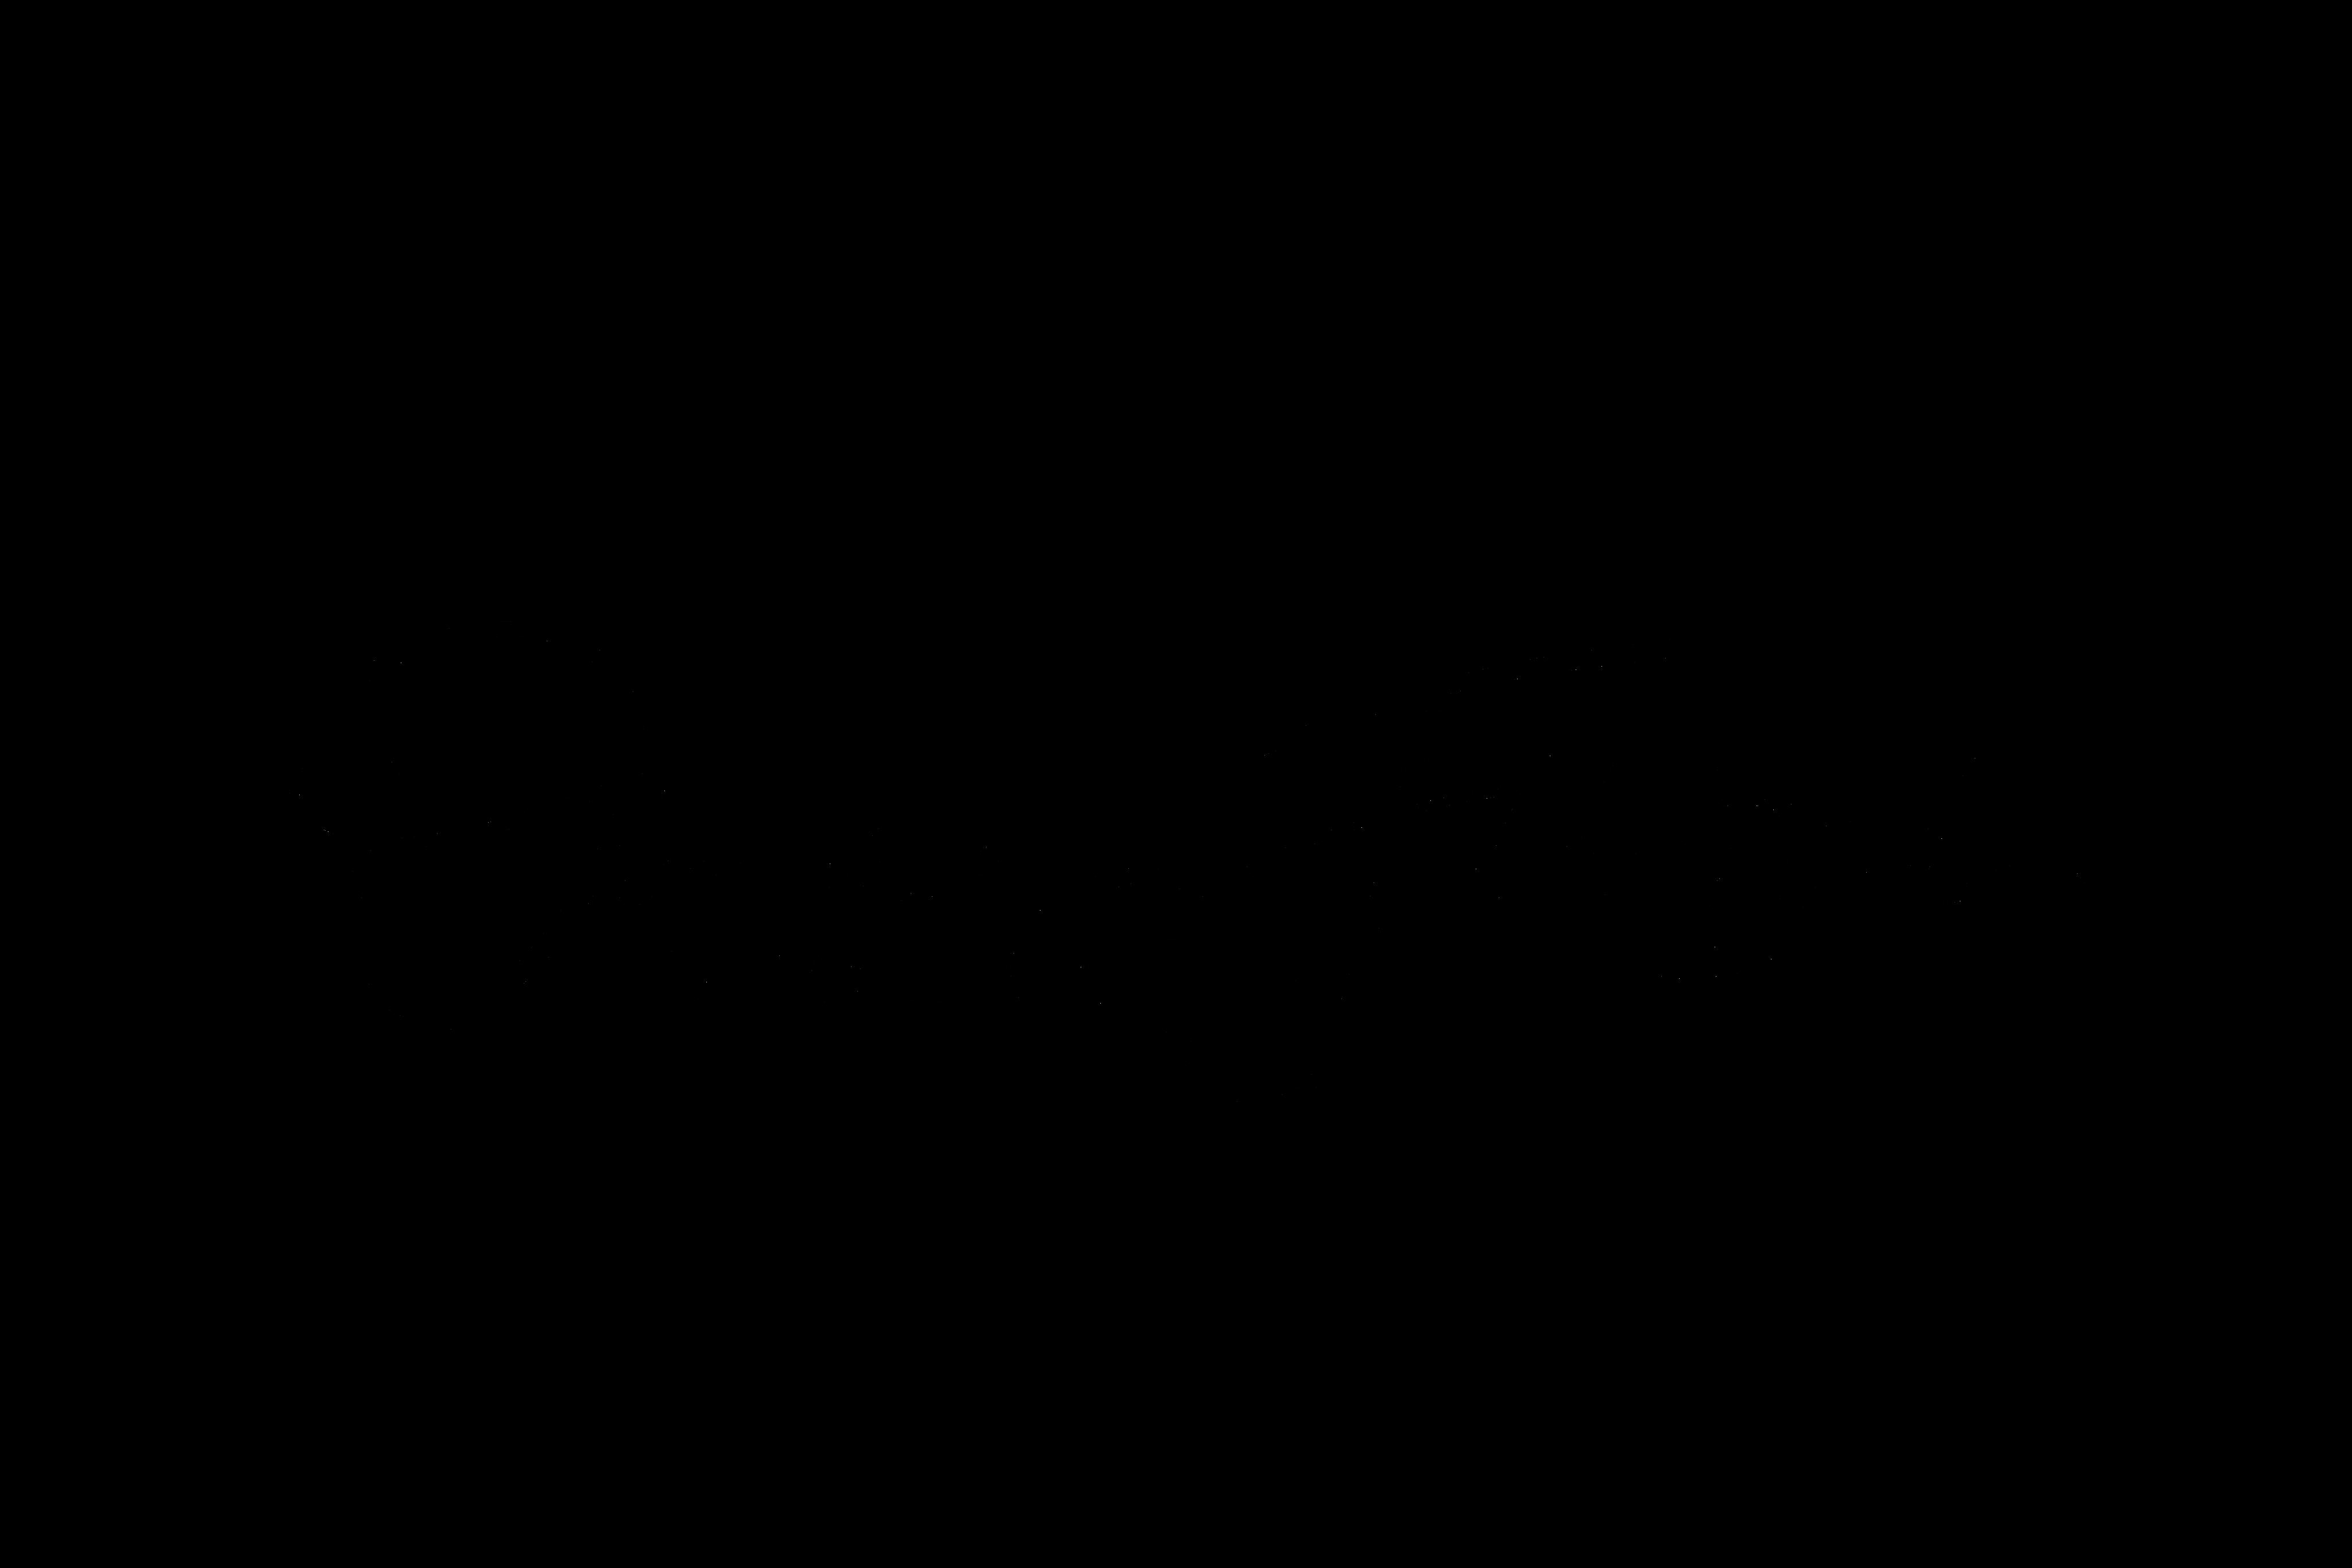 omar filippi